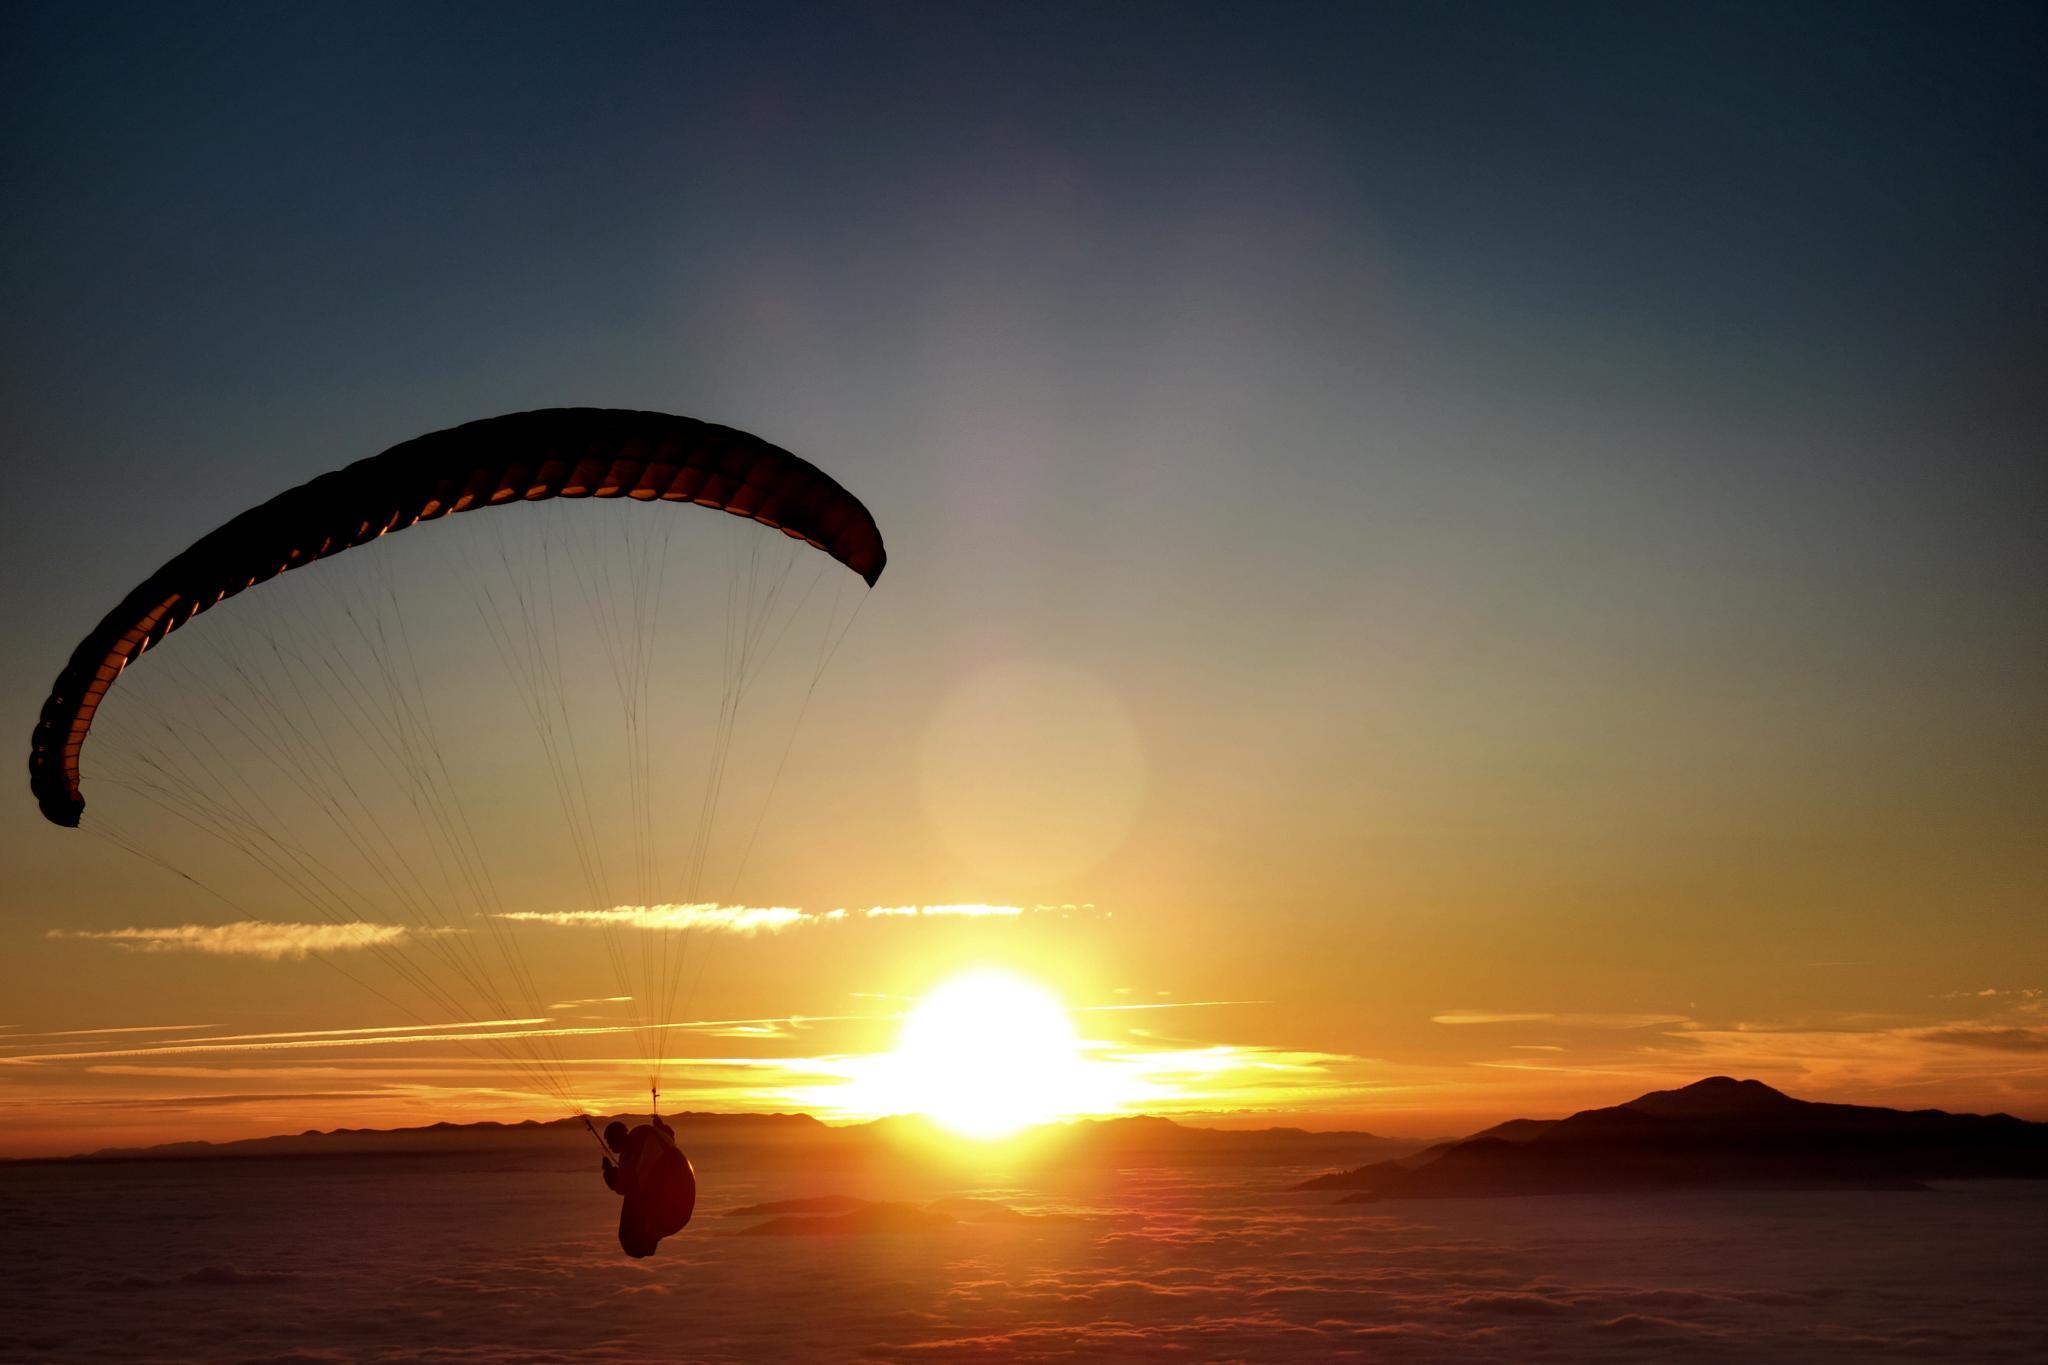 flying to the sun above fog by BernardaBizjak